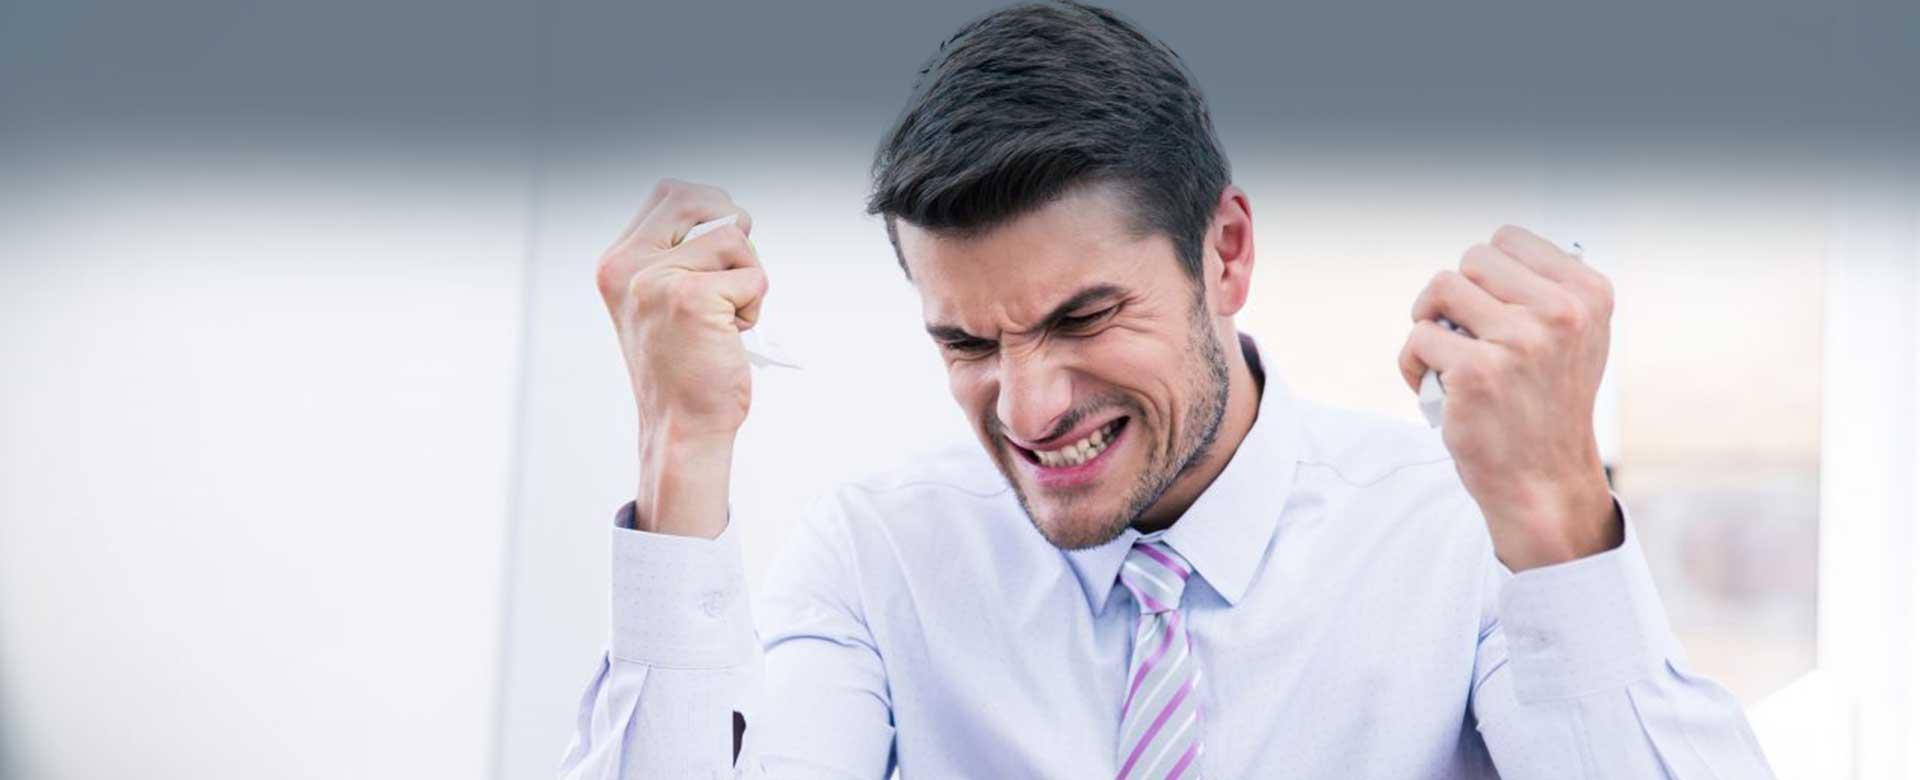 Anger Management, Home of Wellness